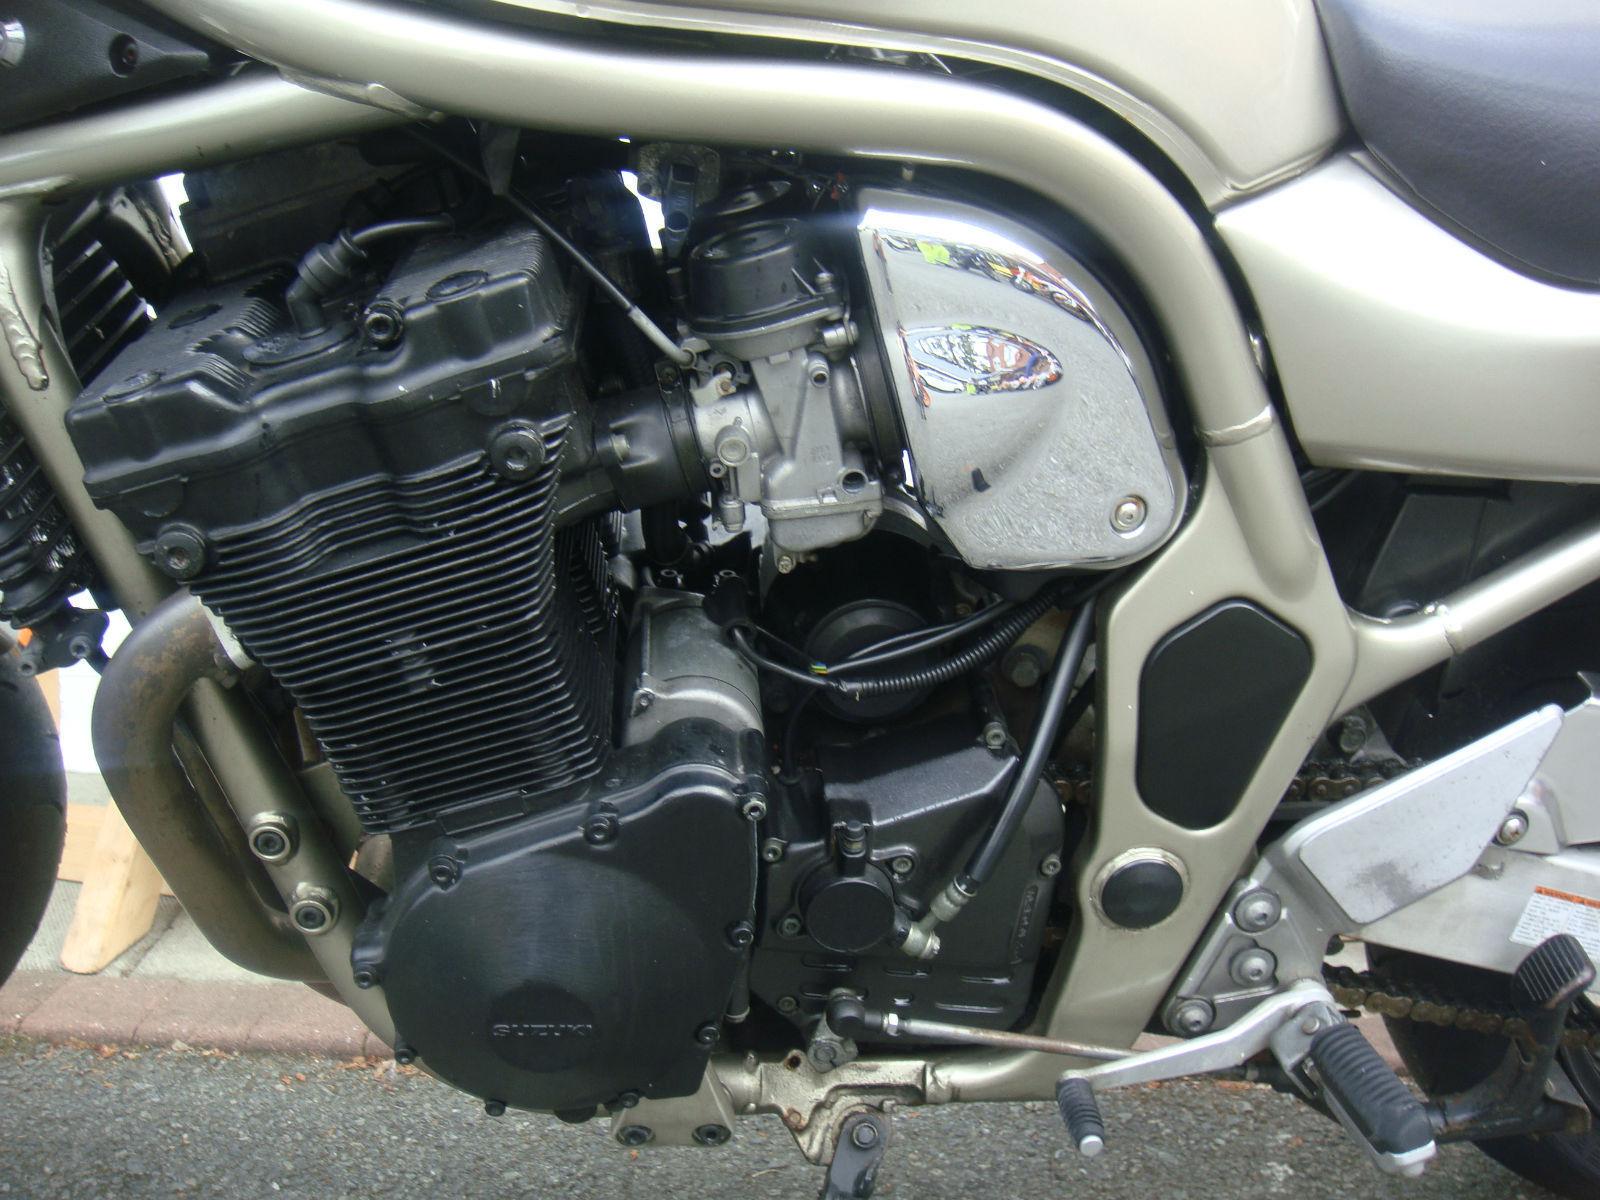 2000 Suzuki GSF 1200 N Bandit Naked Streetfighter Motorcycle